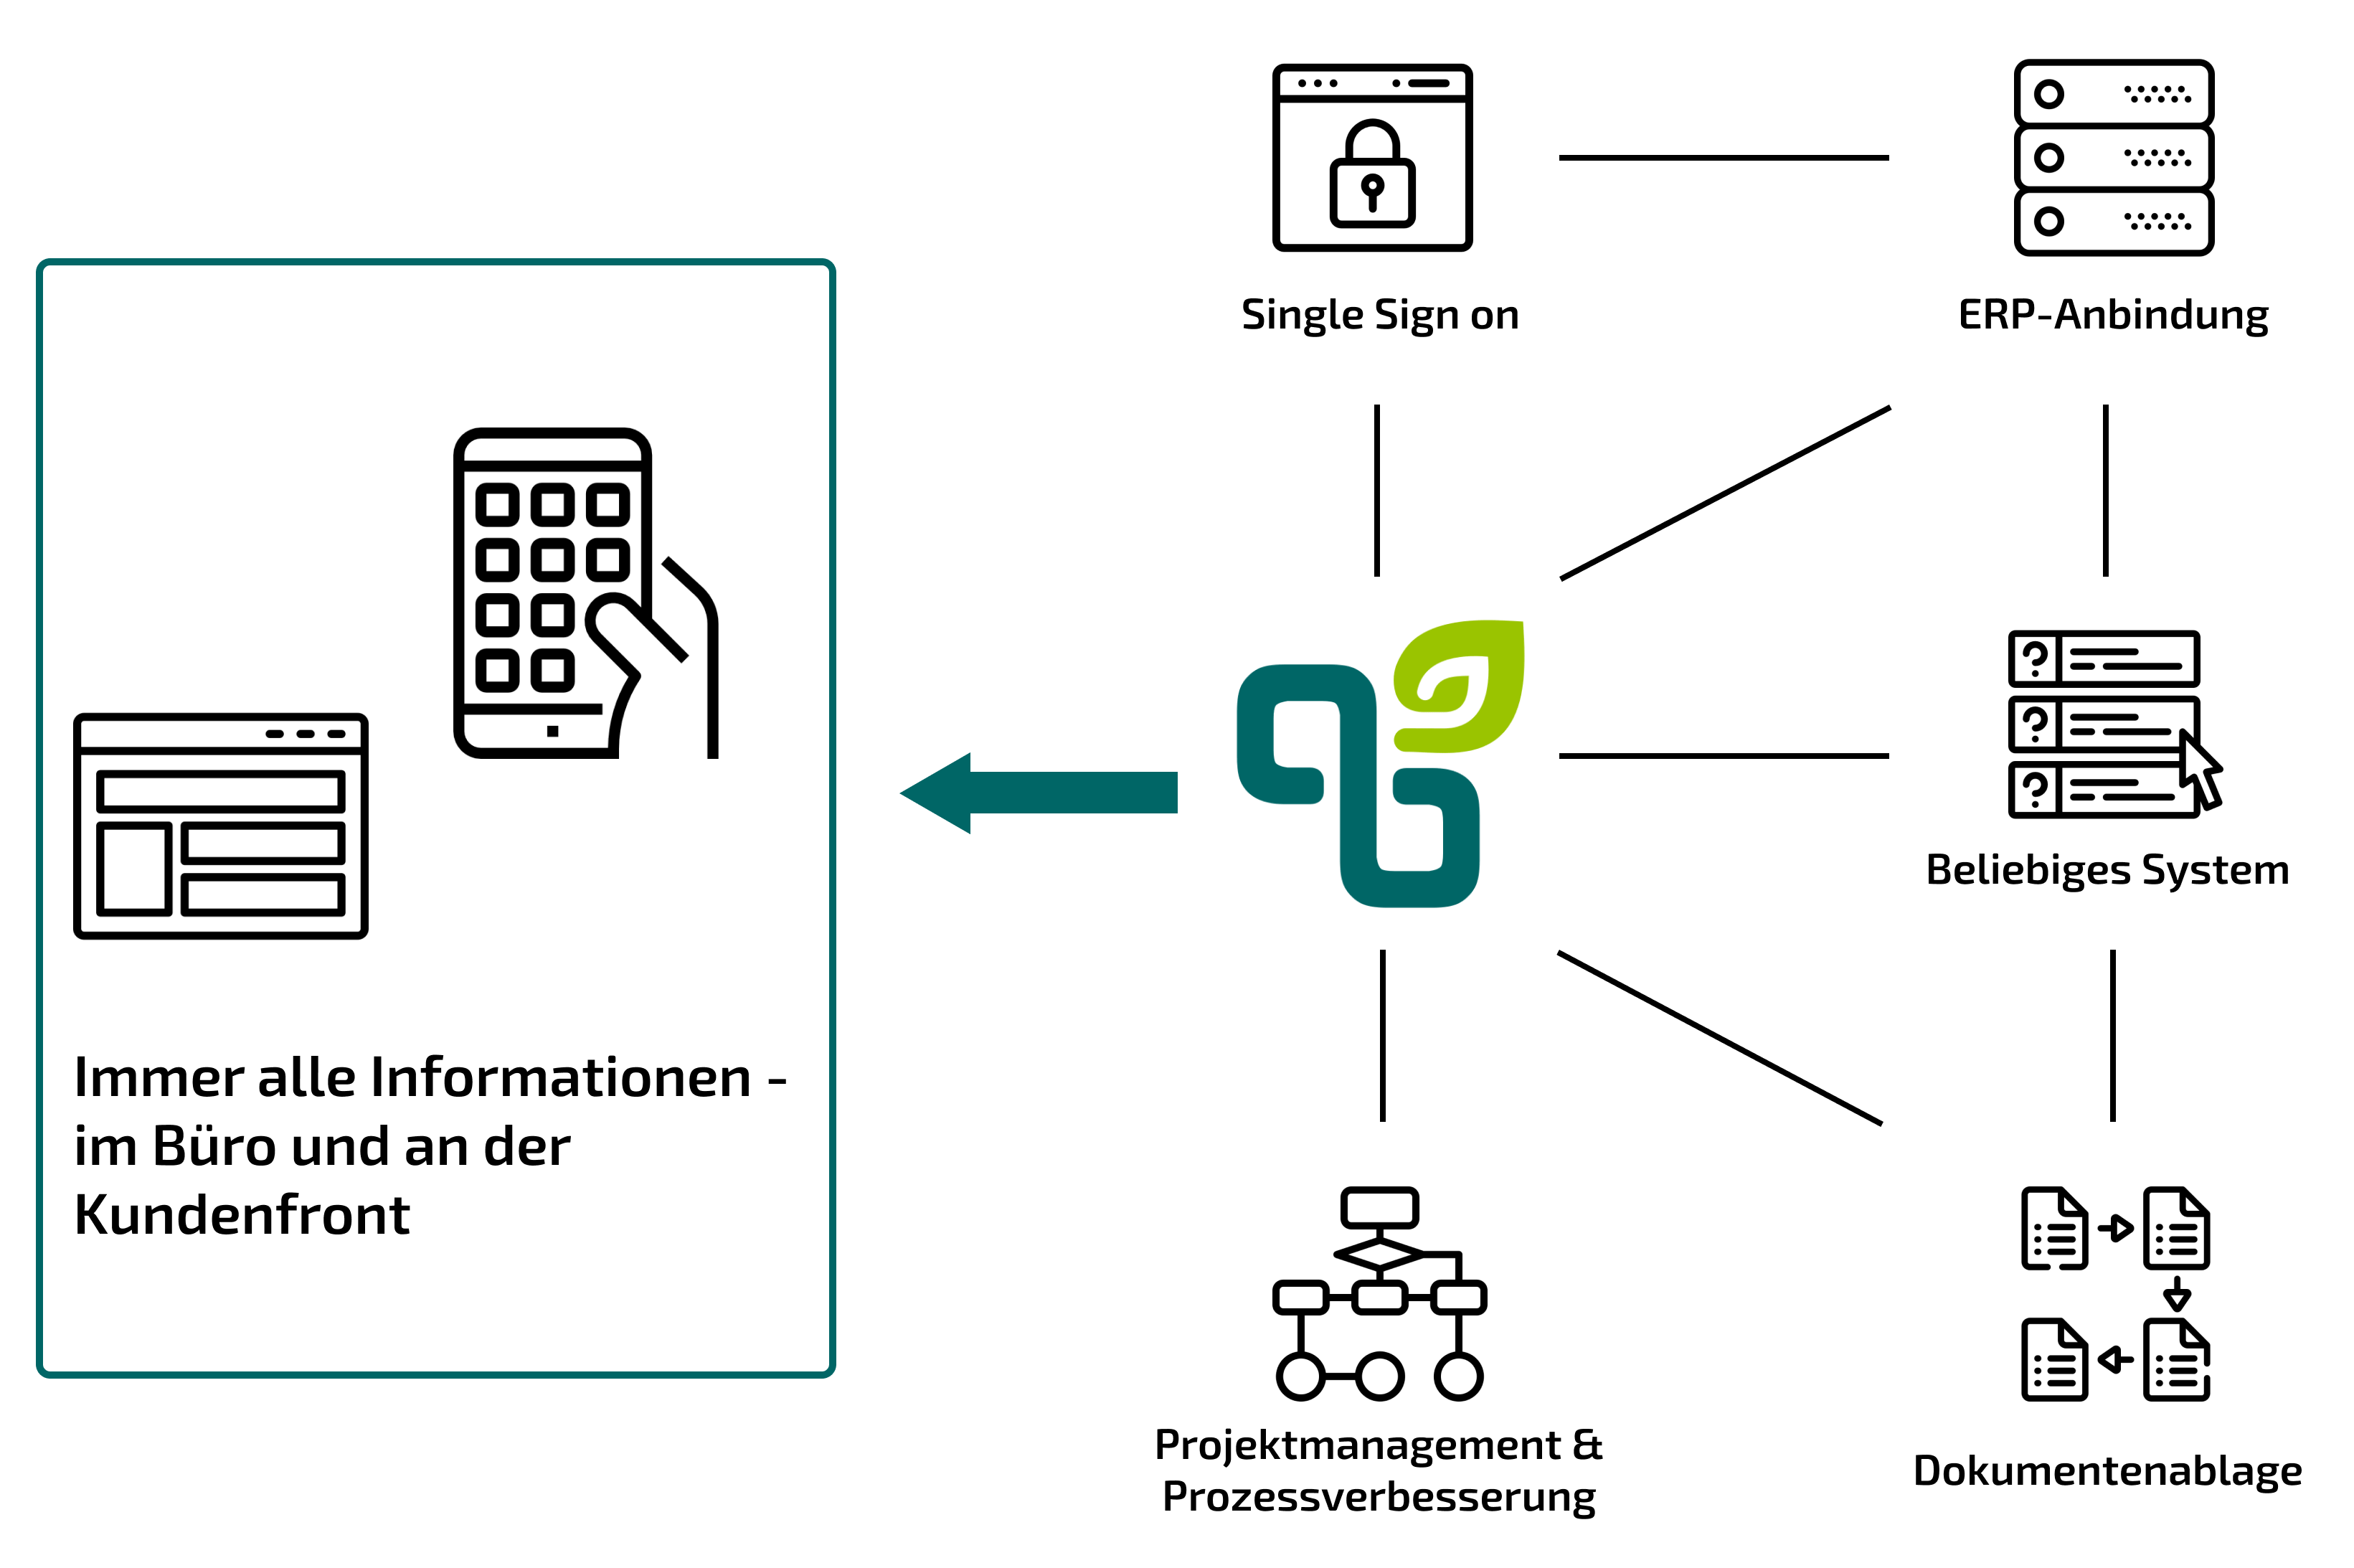 Illustration unseres Integrationsprozesses